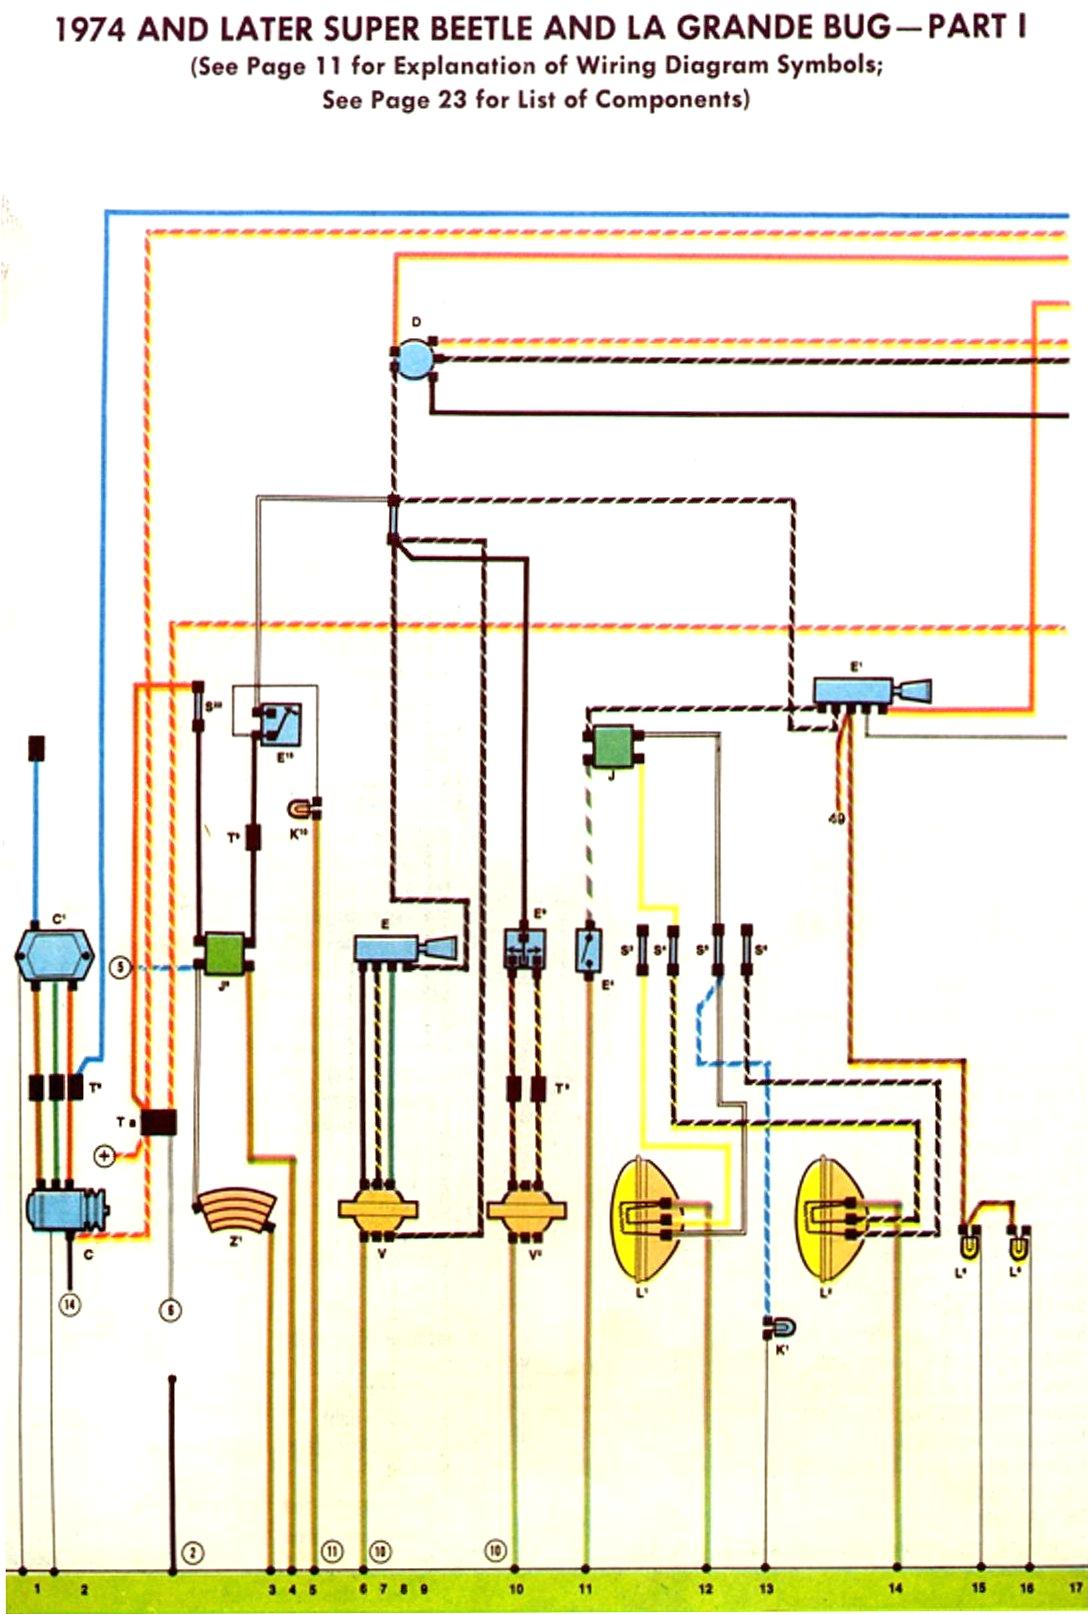 1974 75 super beetle wiring diagram thegoldenbug com 1974 beetle fuse box for